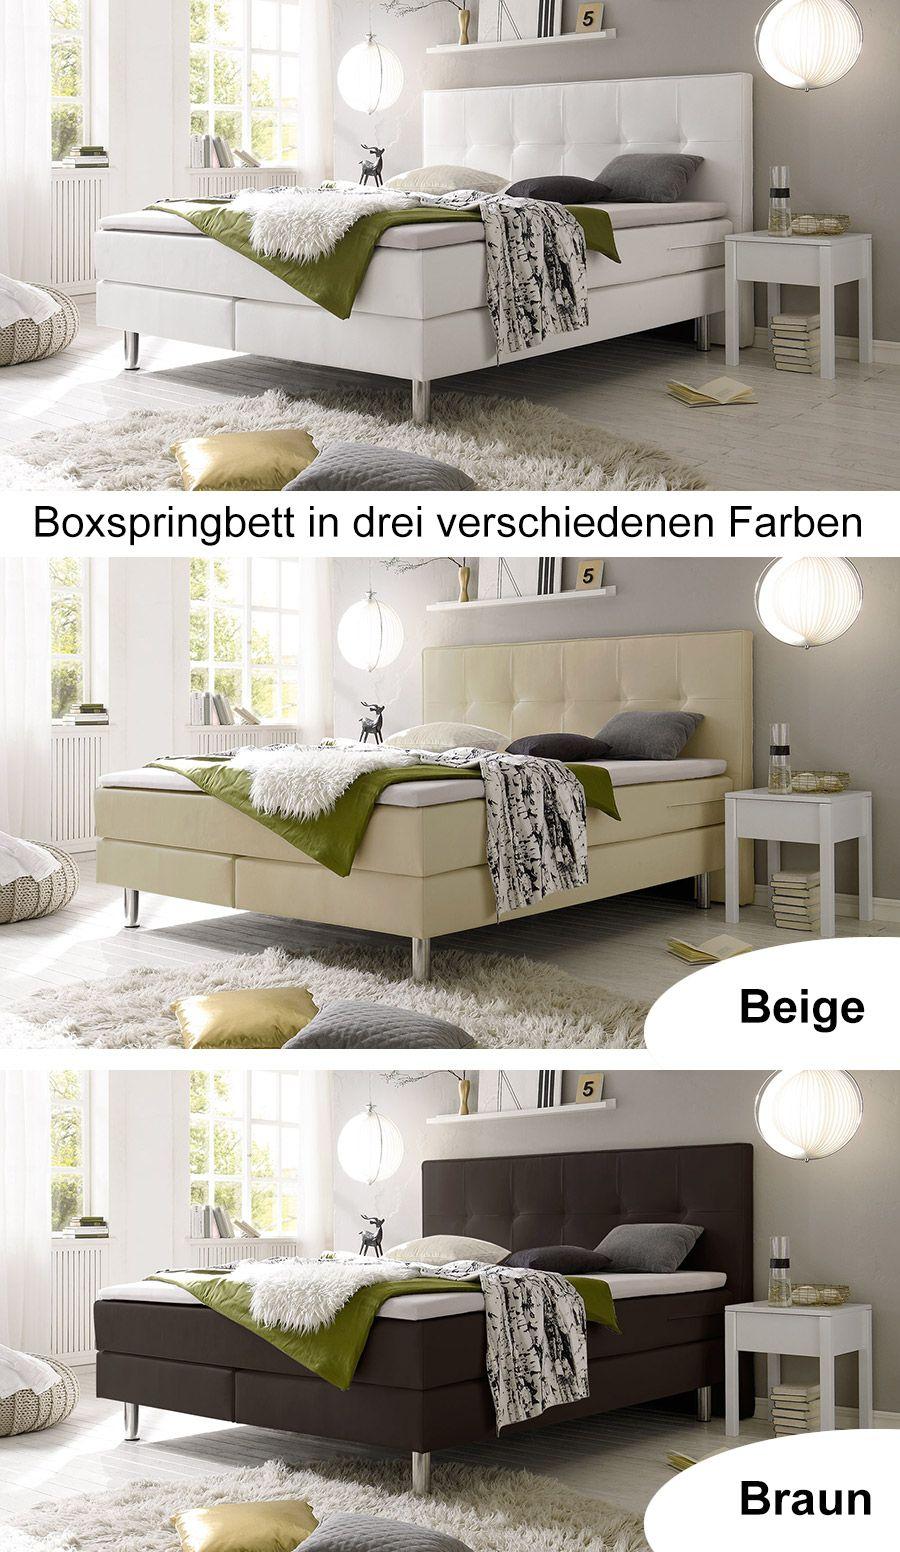 ADA Premium Boxspring Rundbett »Rebecca«, Inklusive  Tonnentaschenfederkern Matratze | MODERN BEDROOM DECOR | Modern Bedroom  Decor, Bedroom Decor Und ...